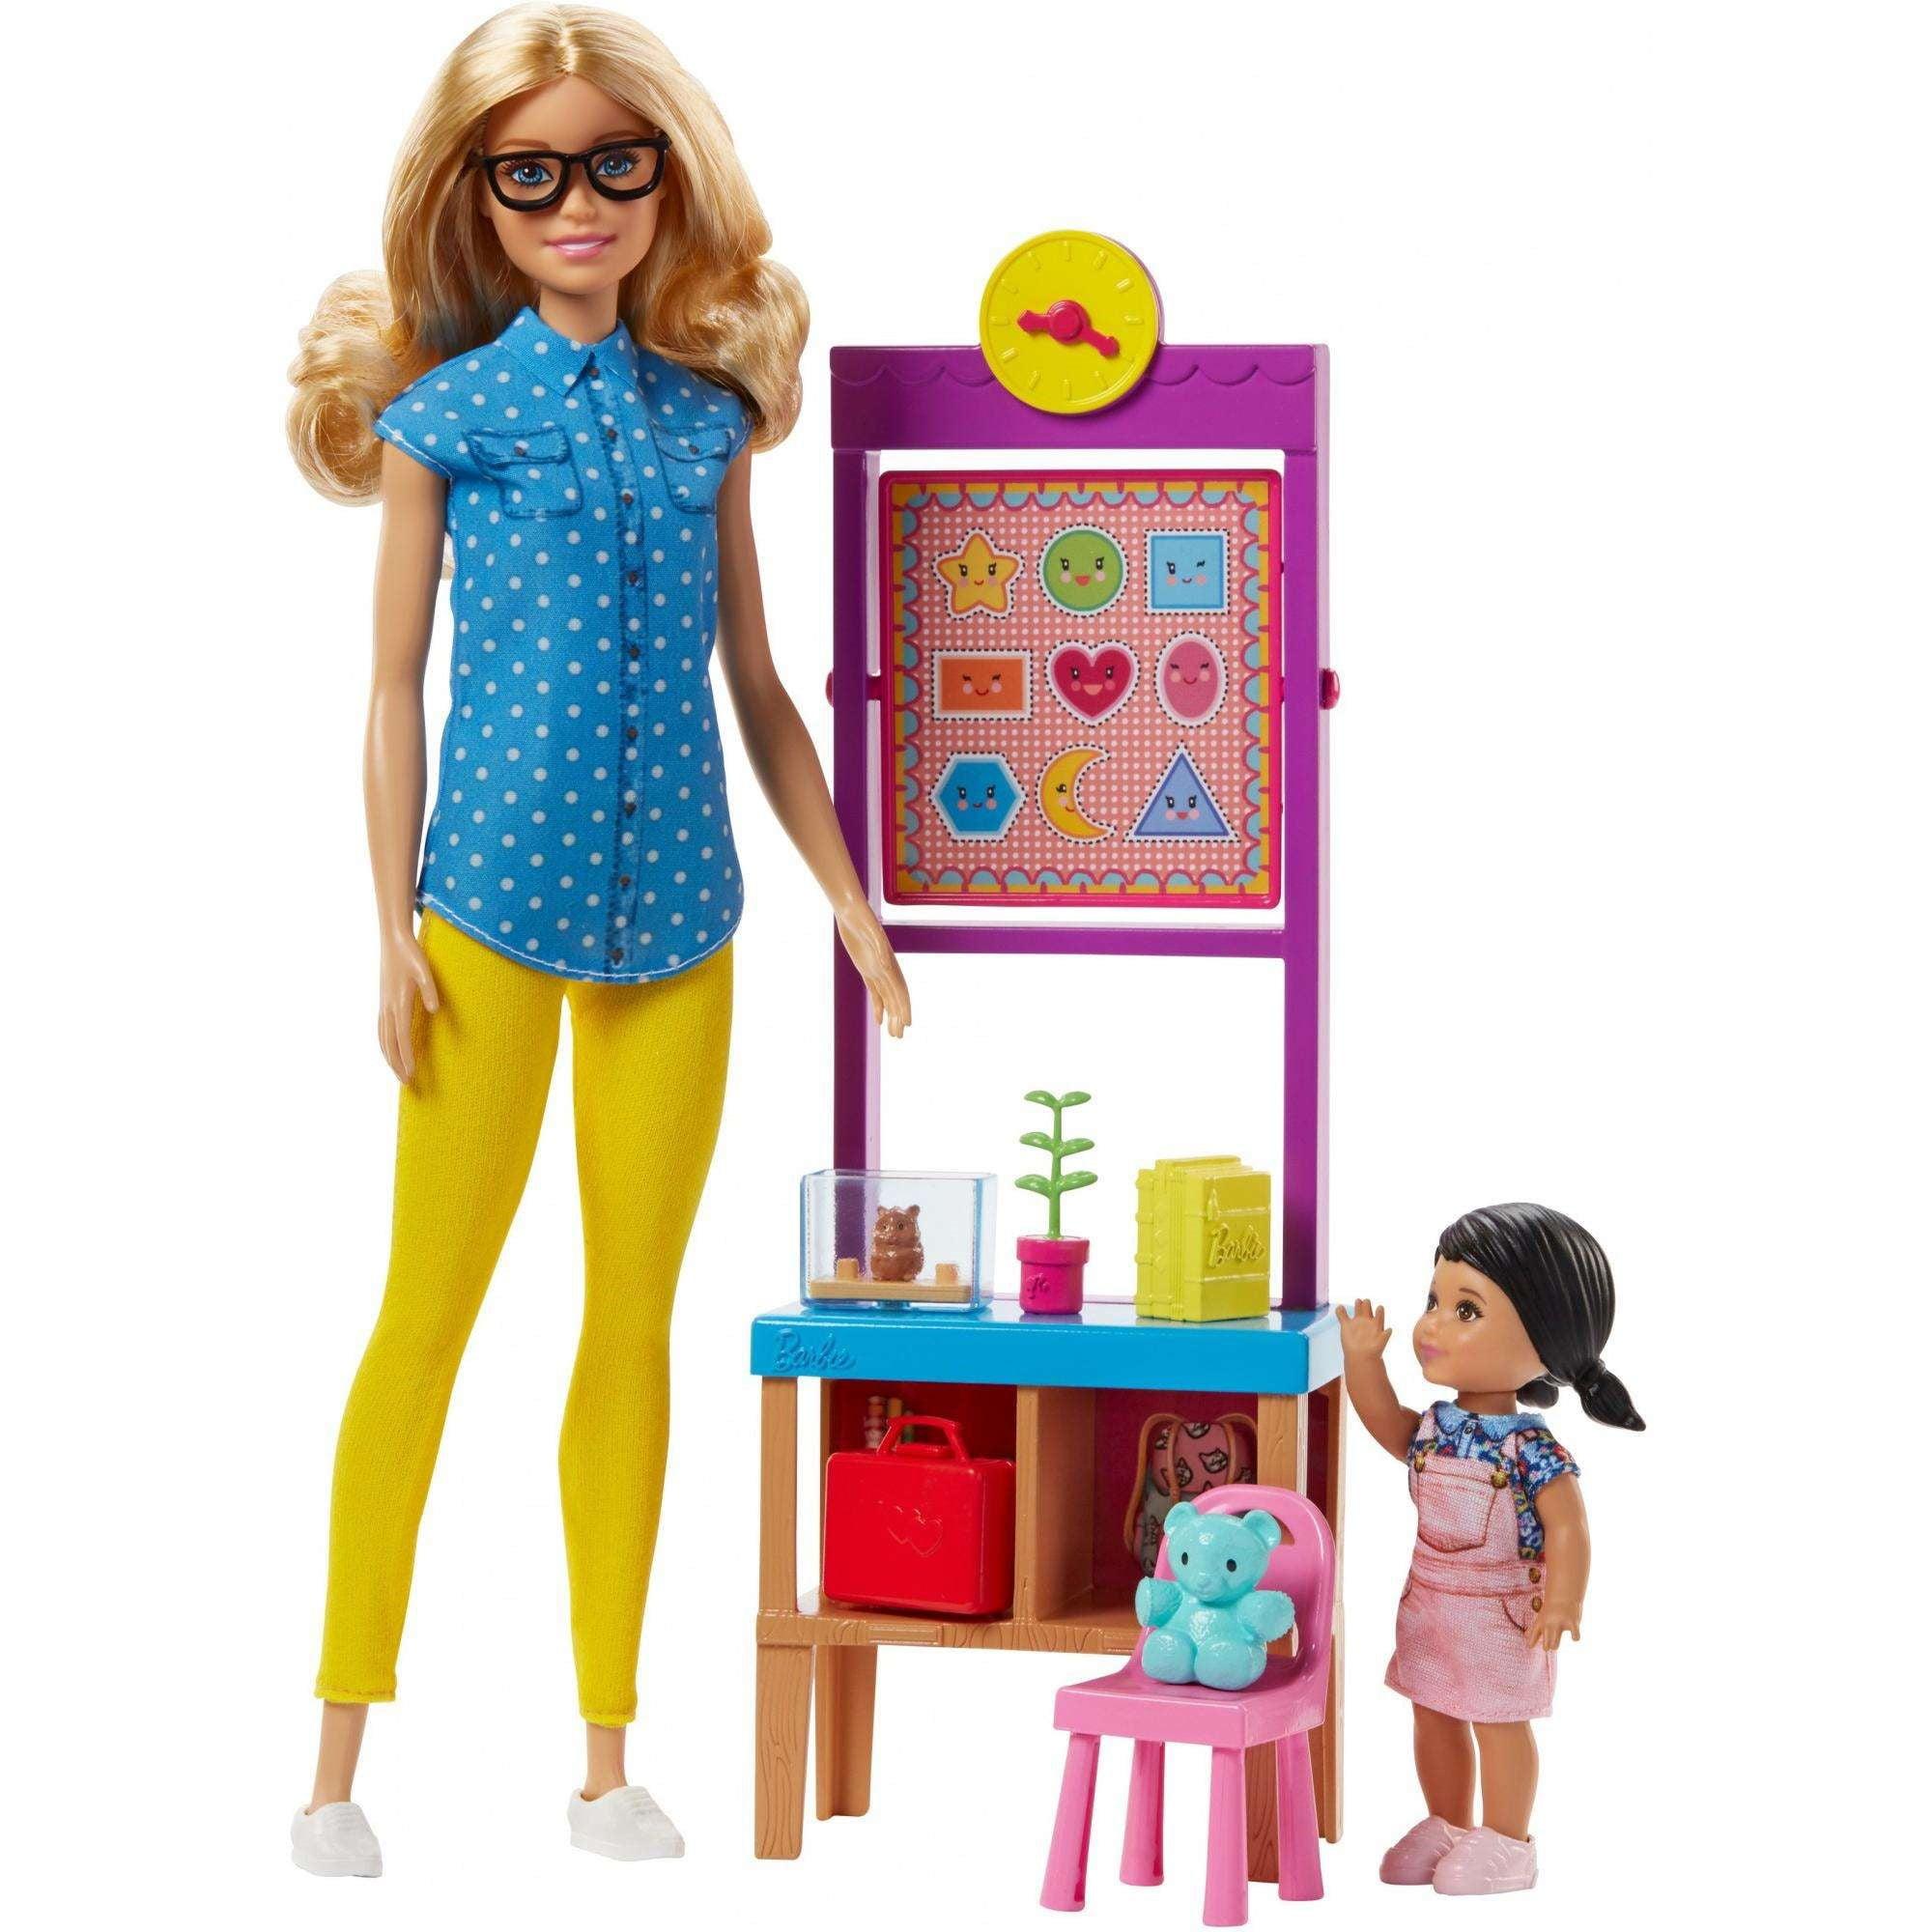 Barbie Careers Teacher Playset and Doll